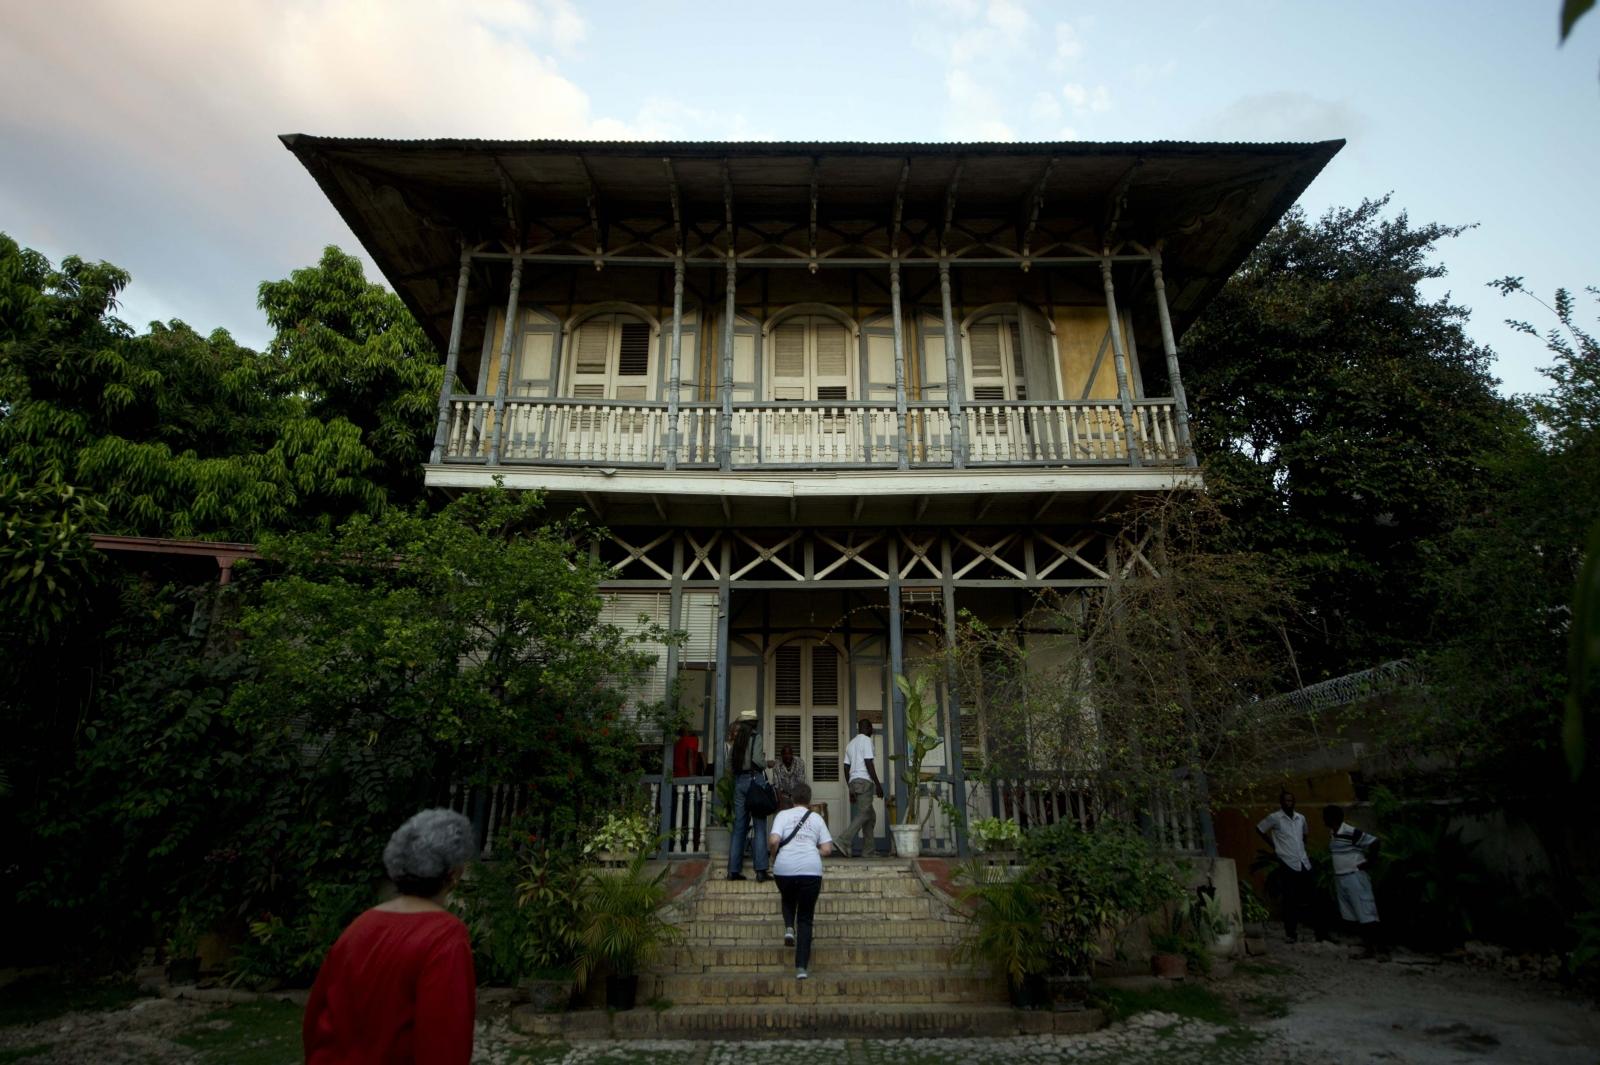 Haitian gingerbread house